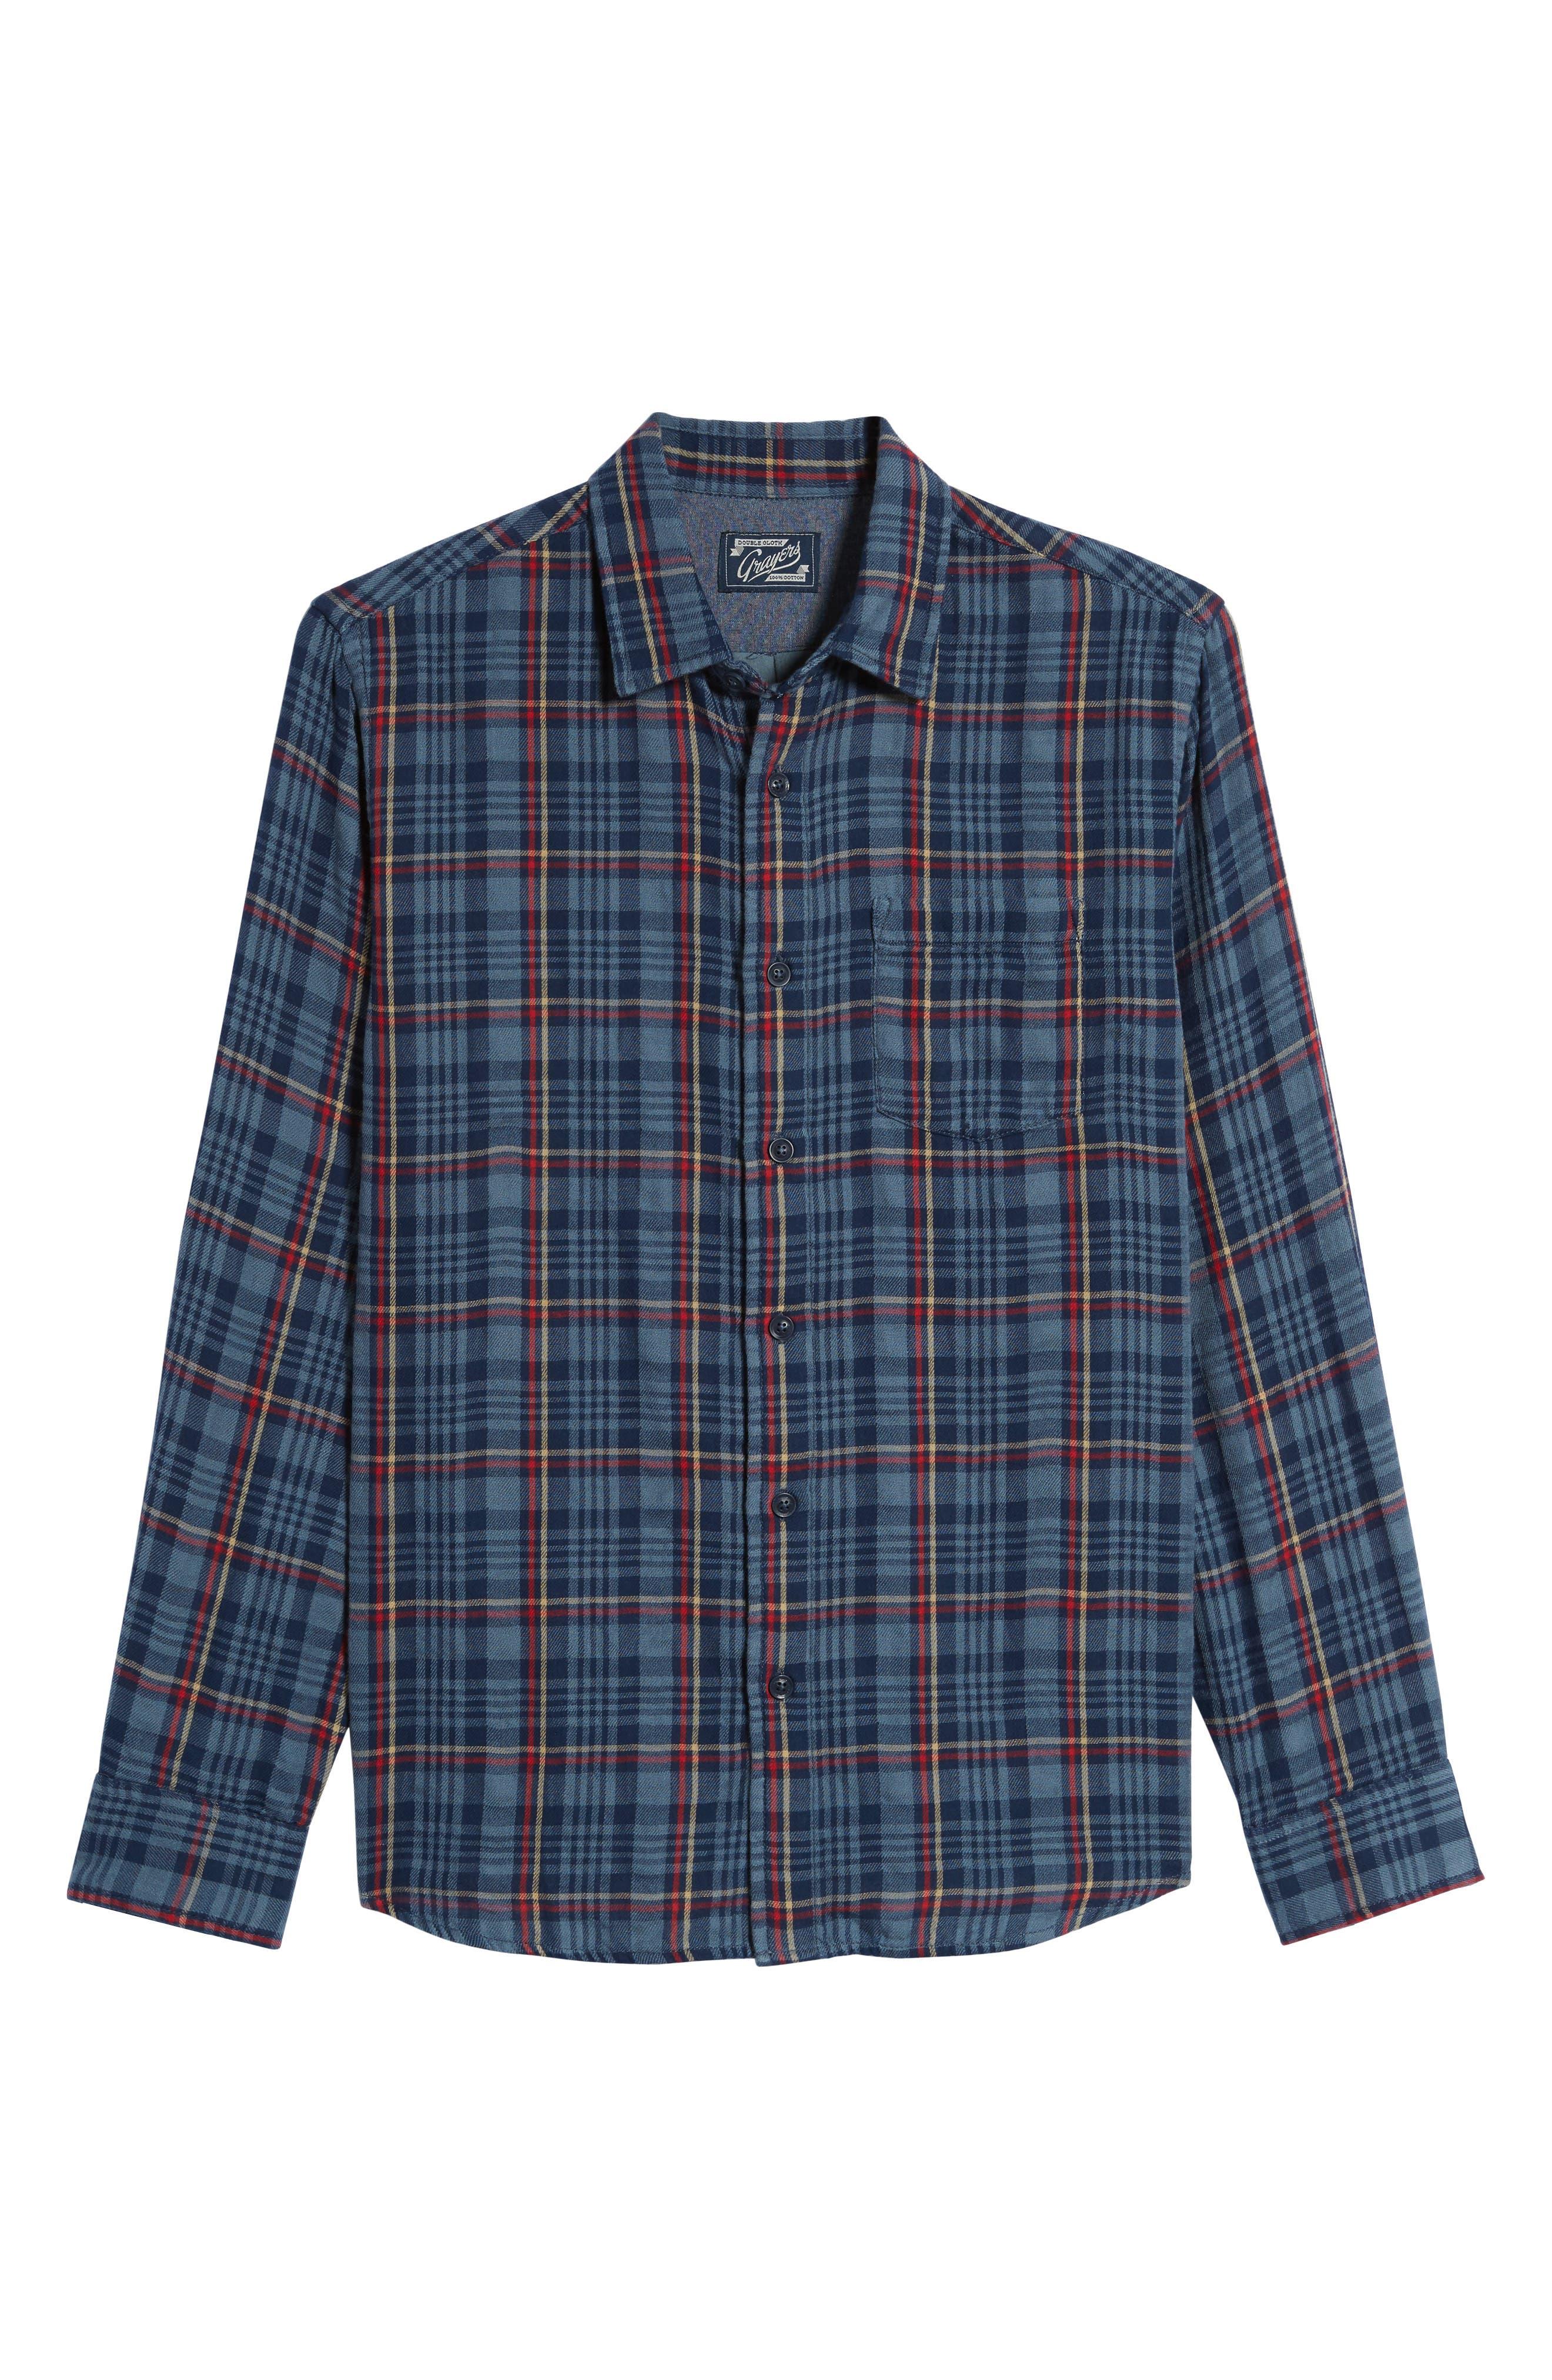 Alton Double Cloth Plaid Sport Shirt,                             Alternate thumbnail 6, color,                             Navy Grey Plaid